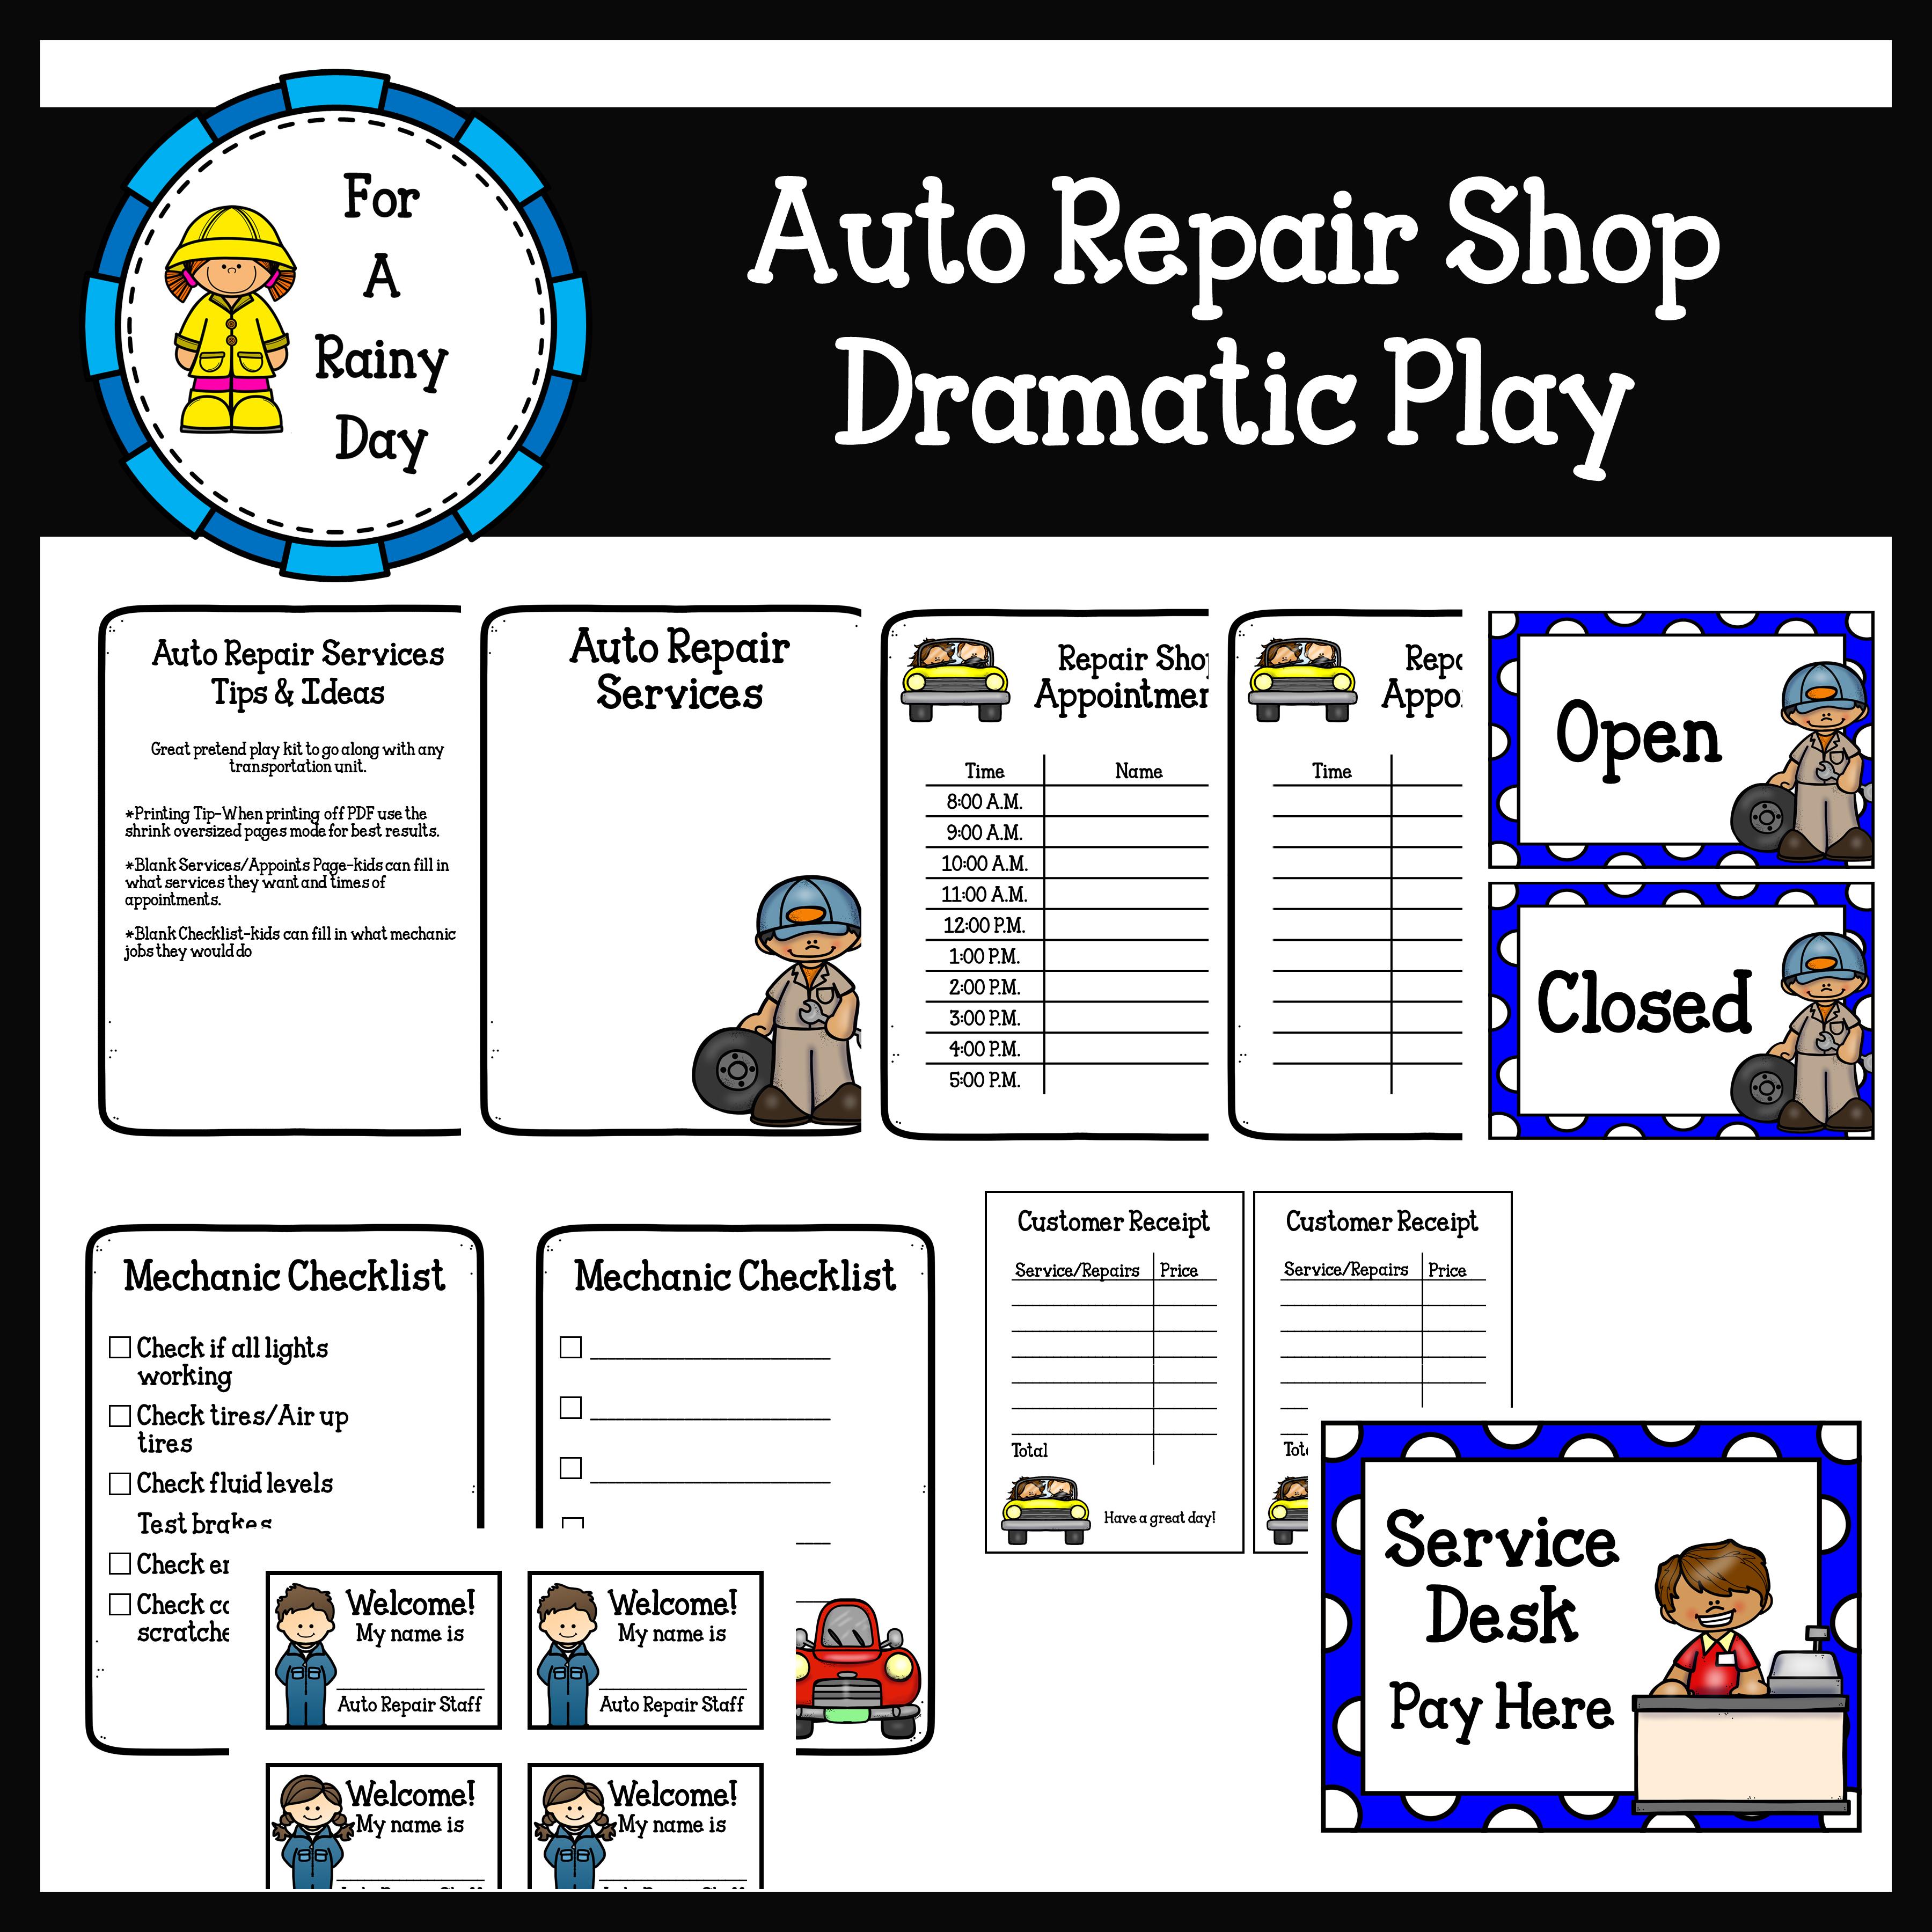 Auto Repair Shop Dramatic Play Auto Repair Shop Auto Repair Dramatic Play